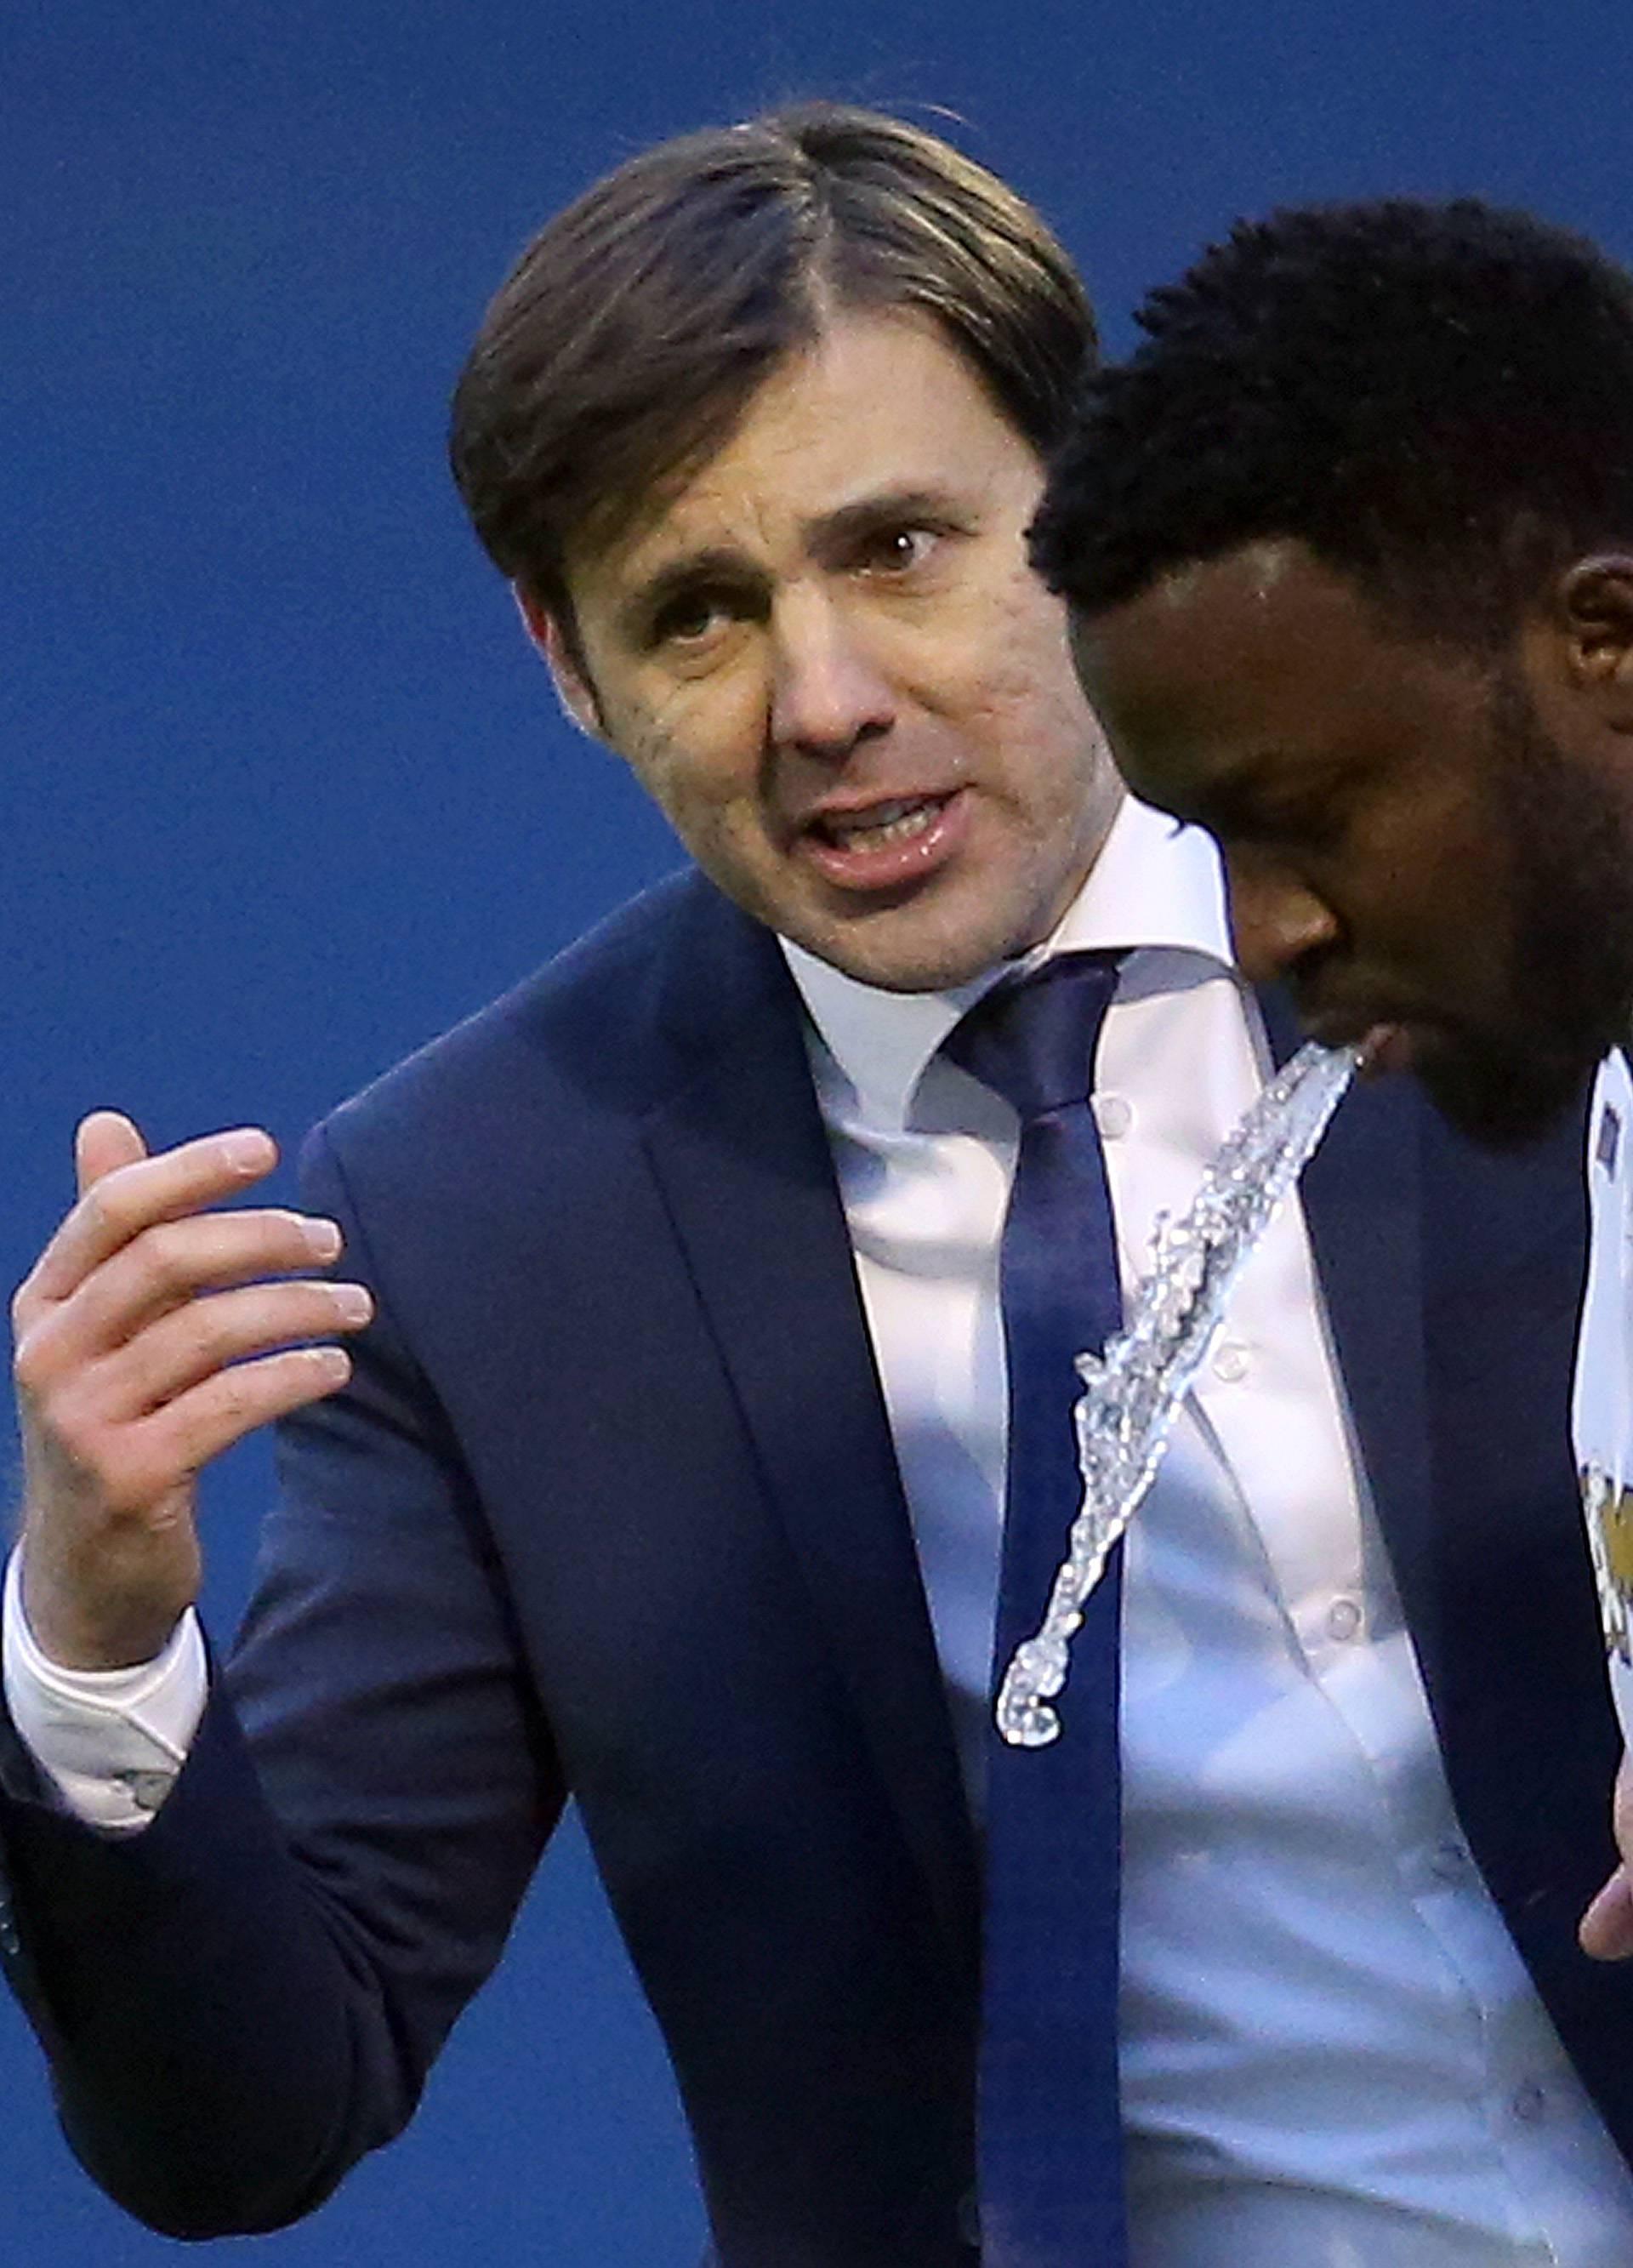 'Zašto igrače Hajduka zovem nadimcima? Pa živimo skupa!'